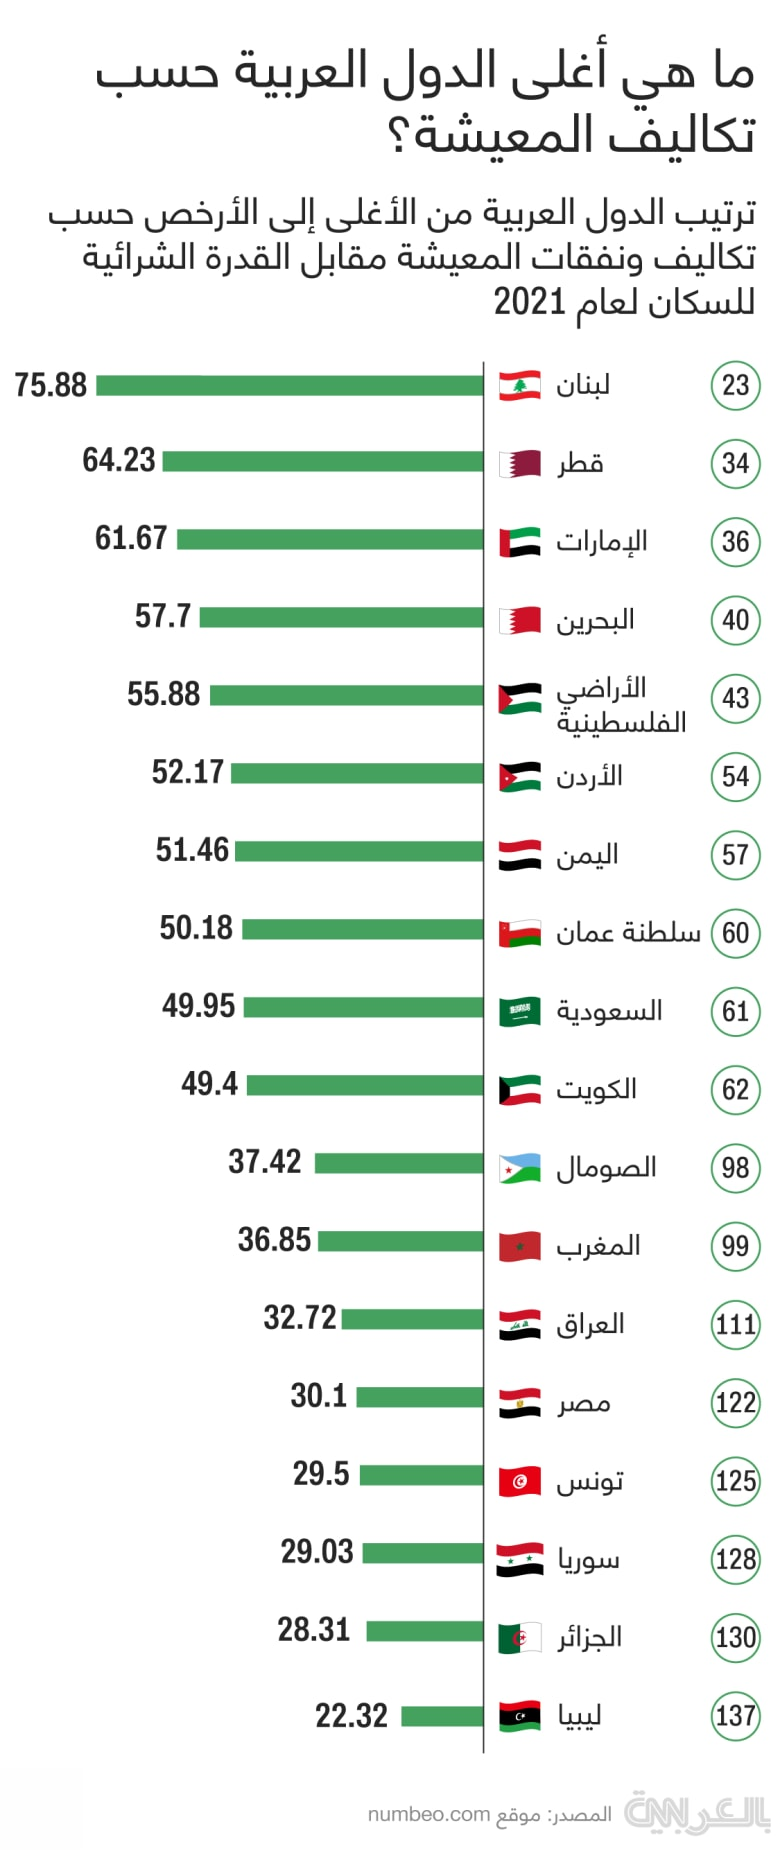 Arab-living-expenses-highest-lowest